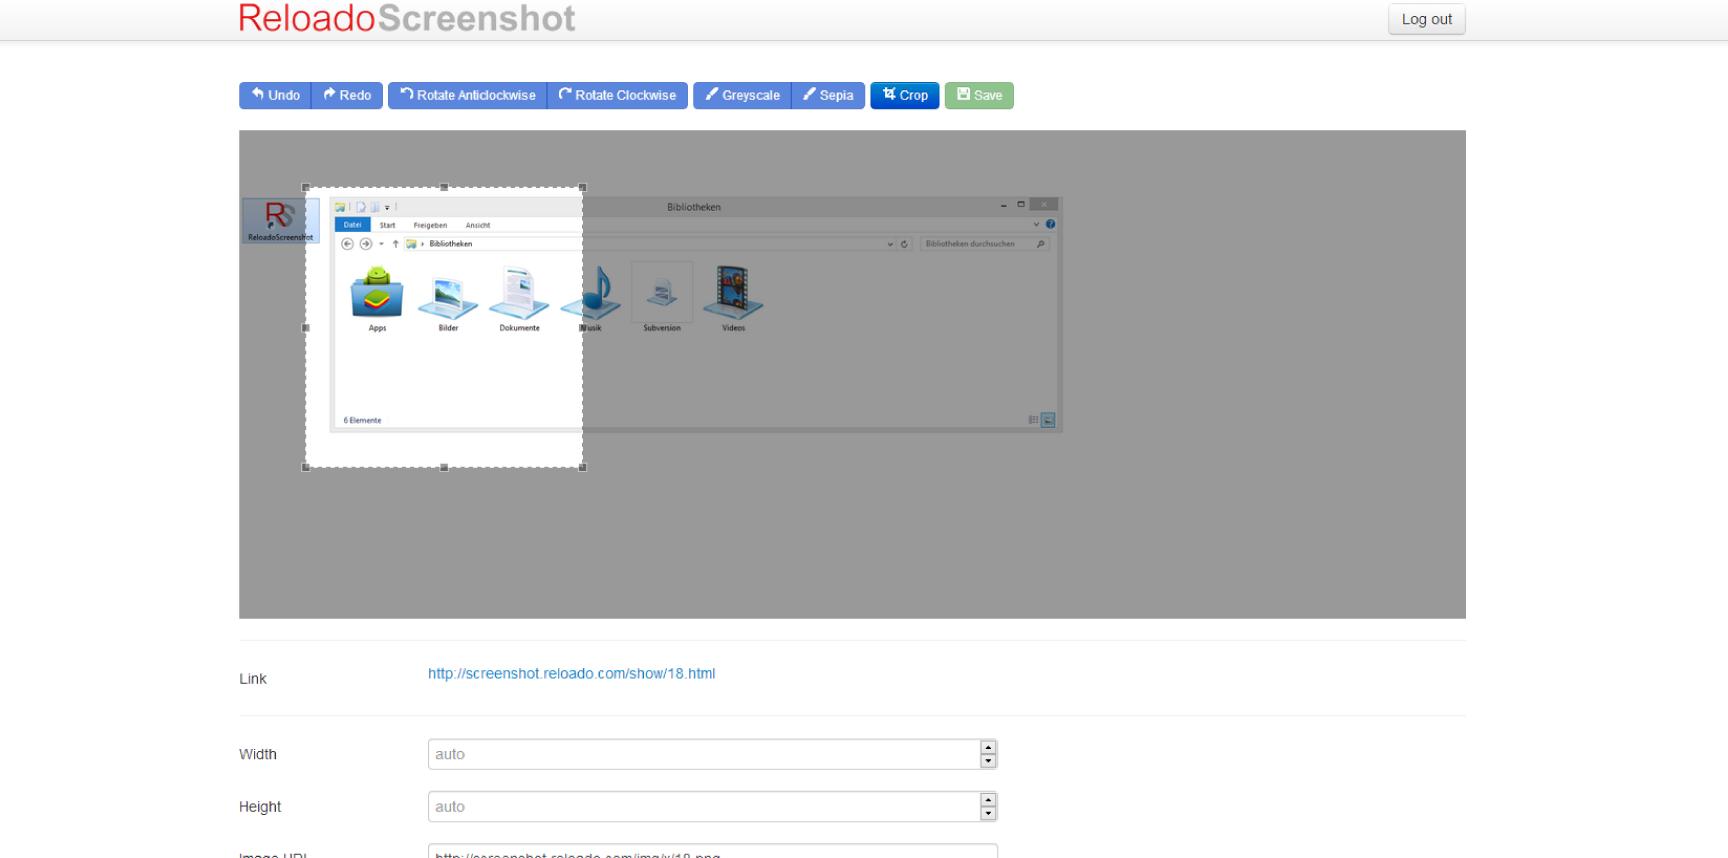 Reloadoscreenshot Take And Share Screenshots